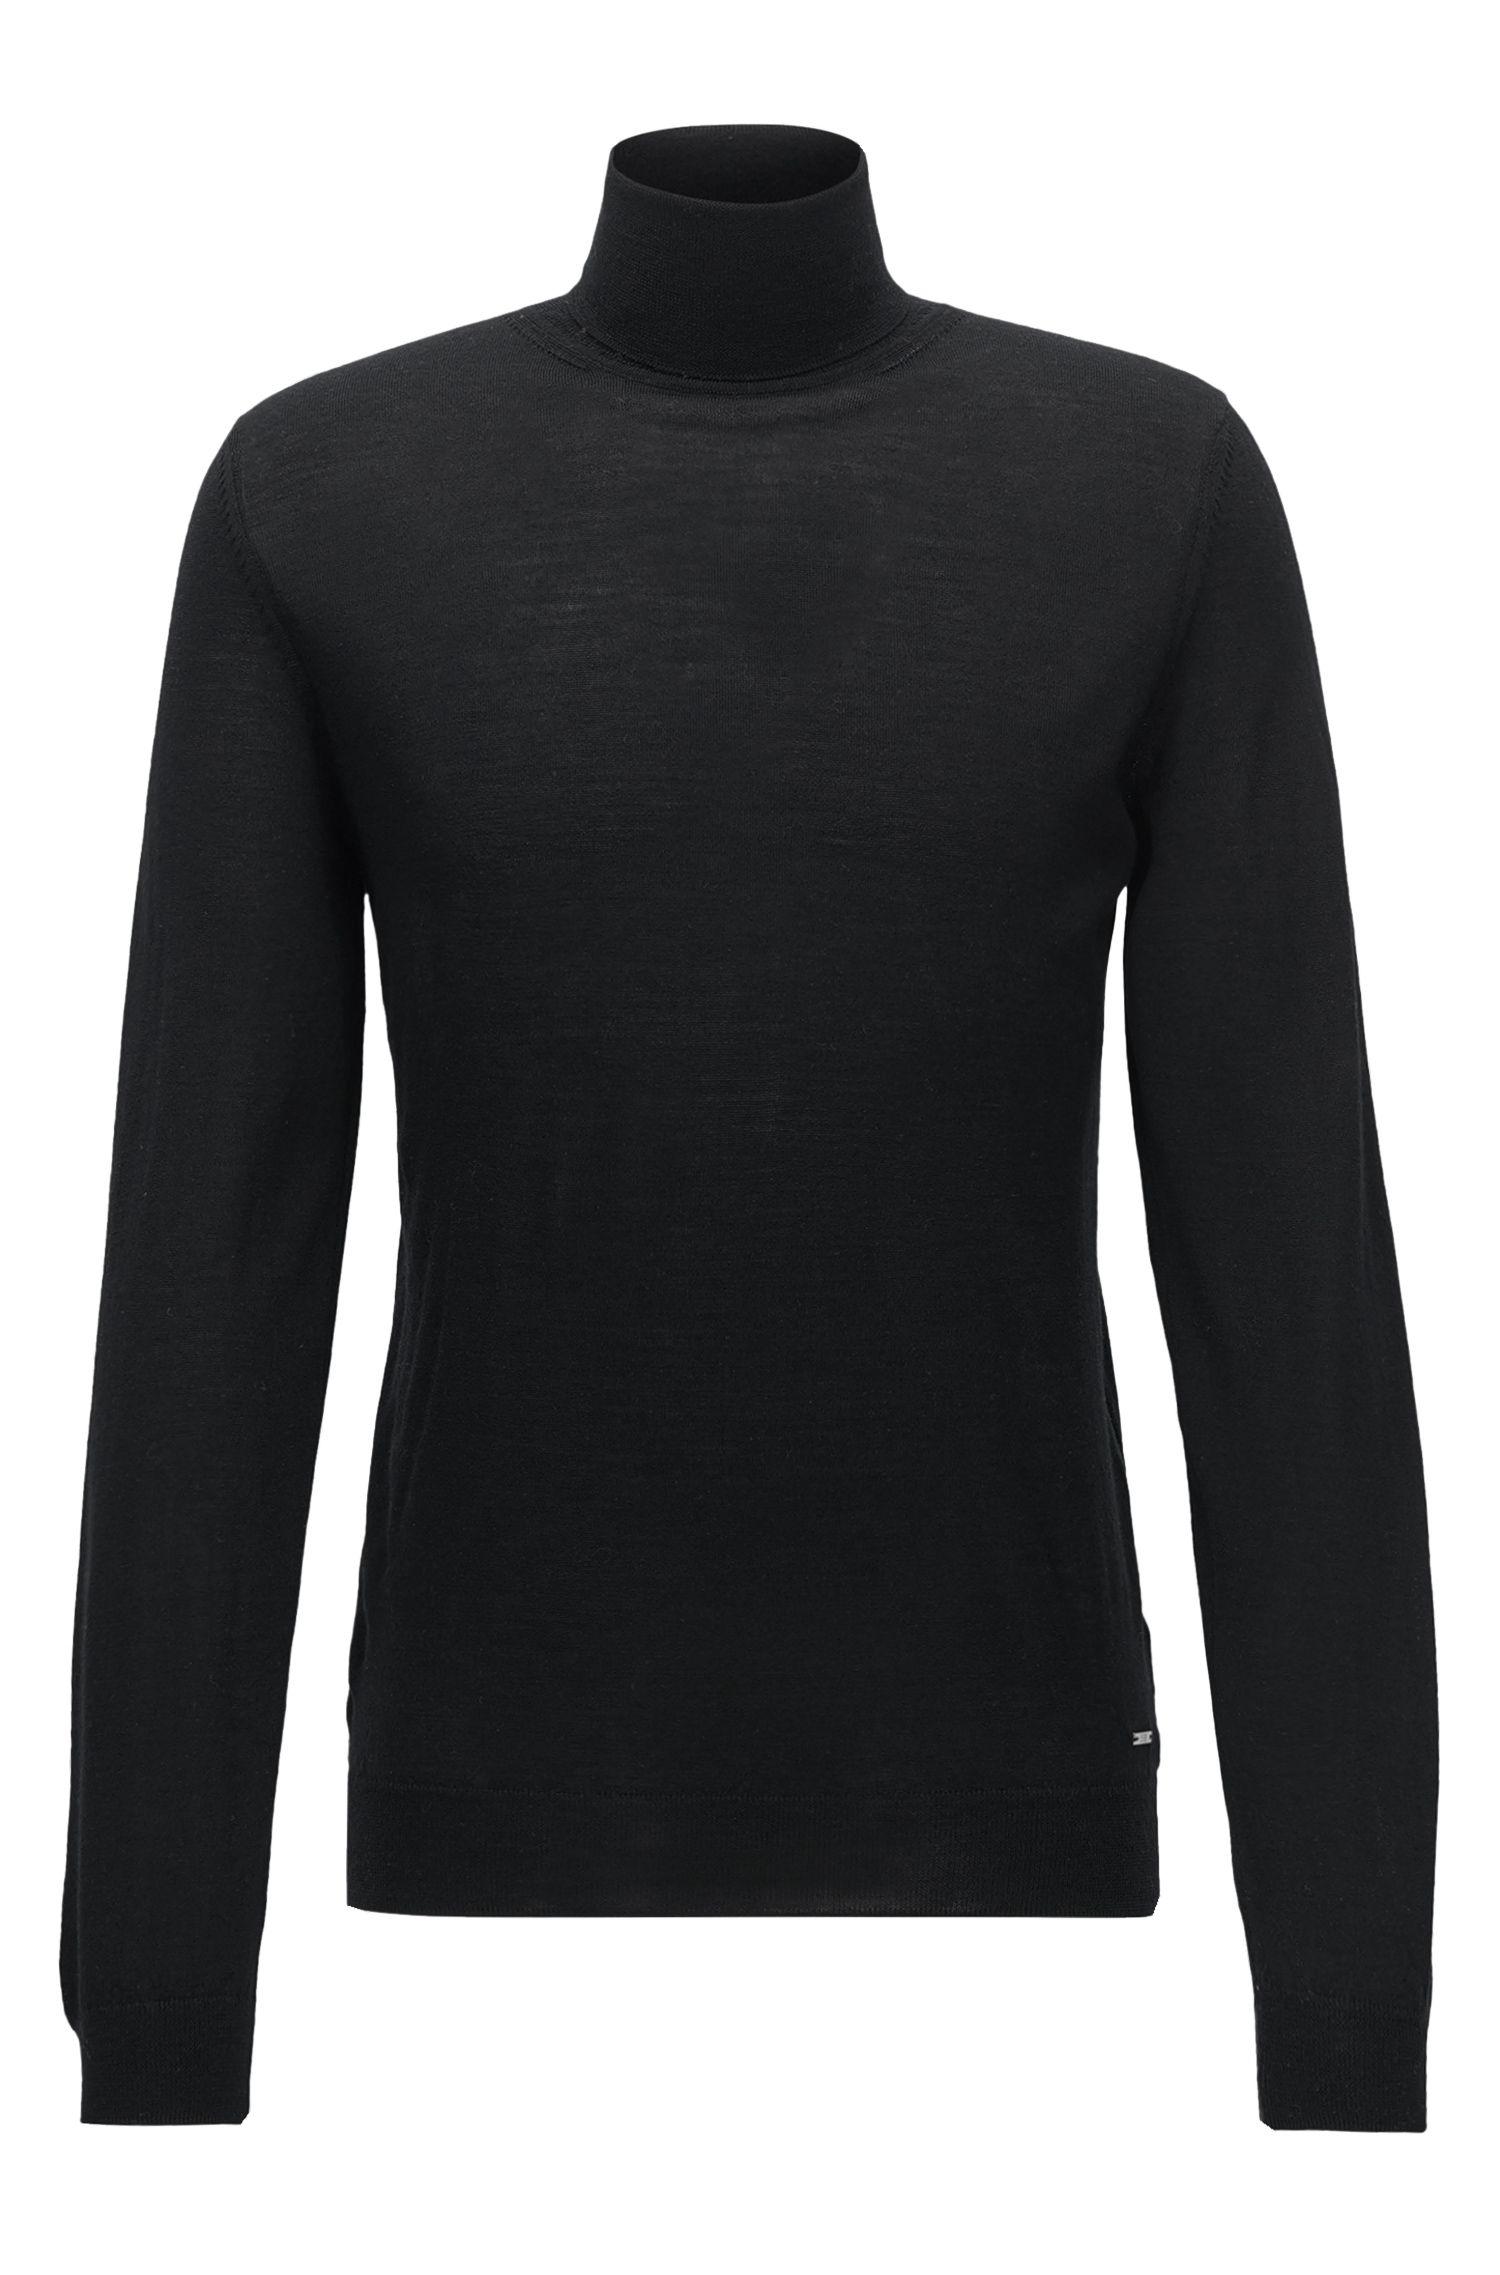 Virgin Wool Silk Turtleneck Sweater | T-Pinello